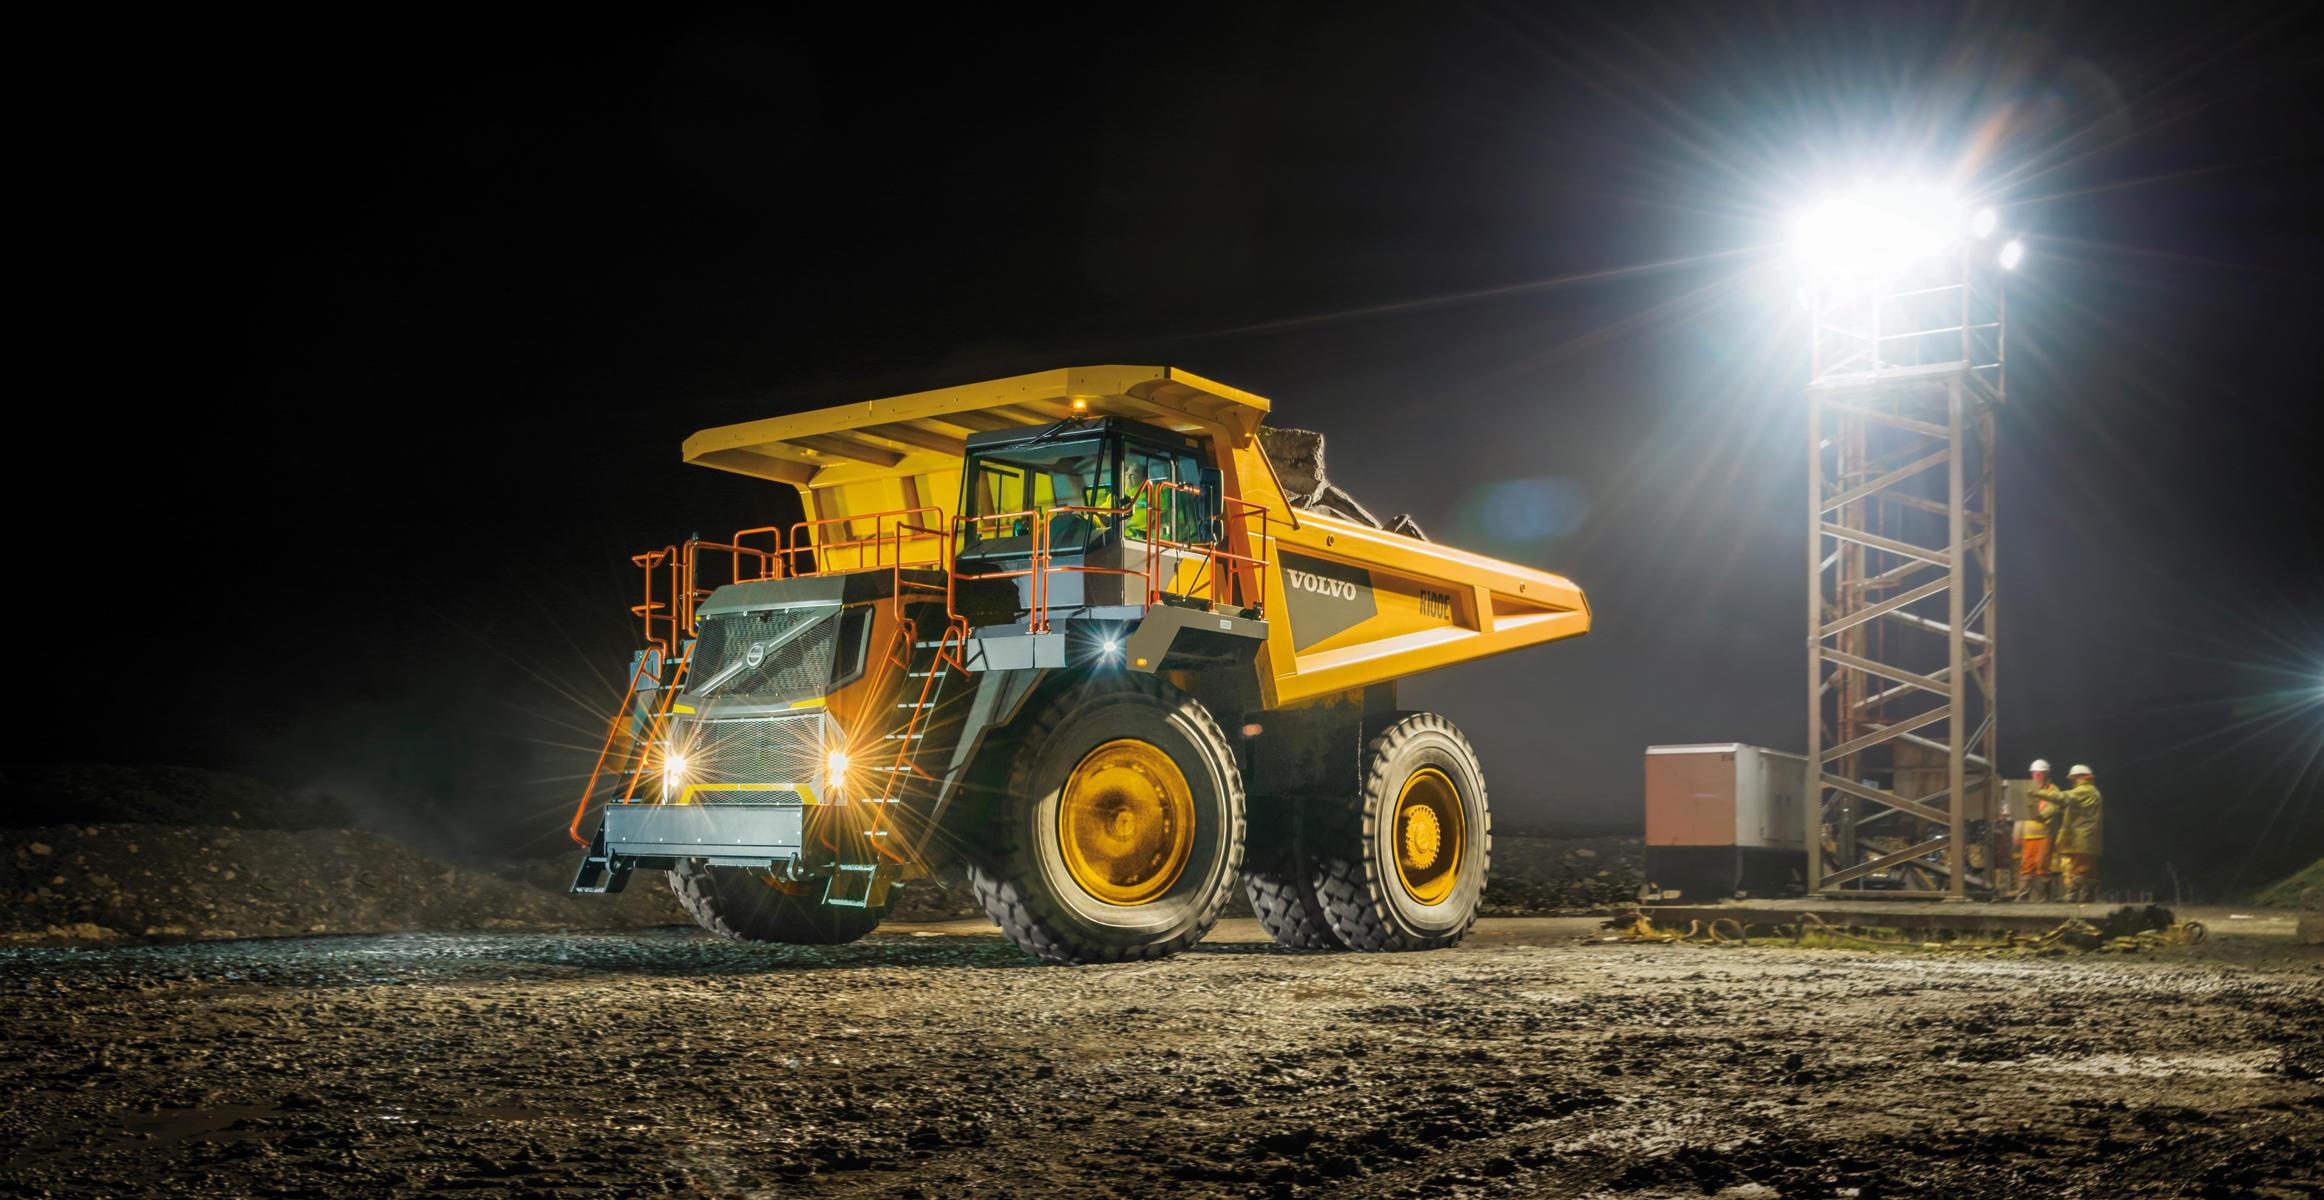 volvo-launches-own-range-of-rigid-haulers-03-2324x1200